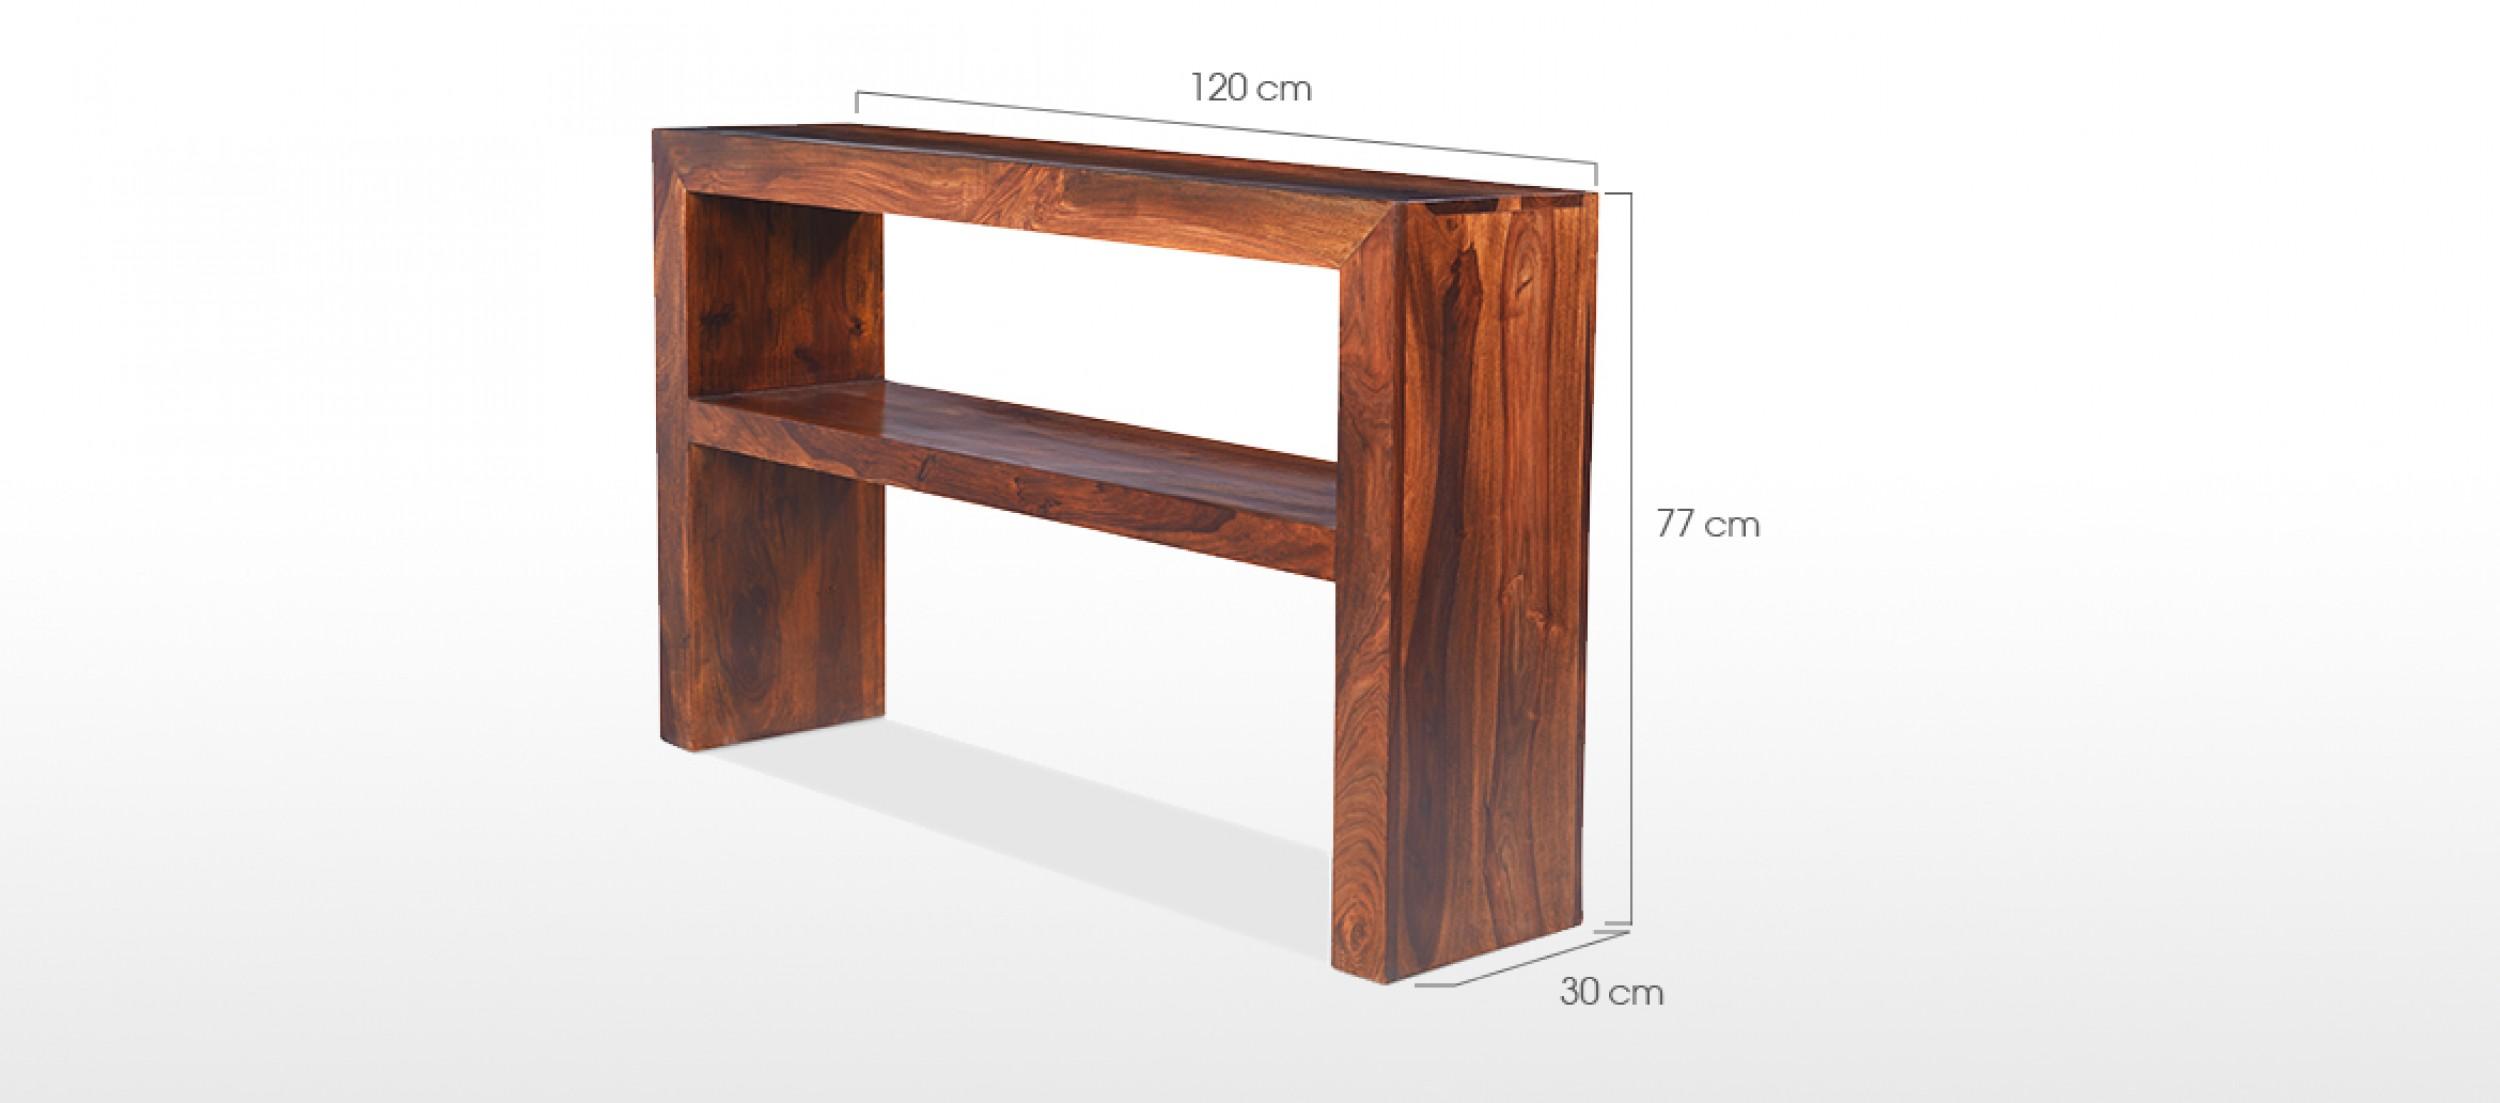 standard sofa table length fulton bed cube sheesham console quercus living